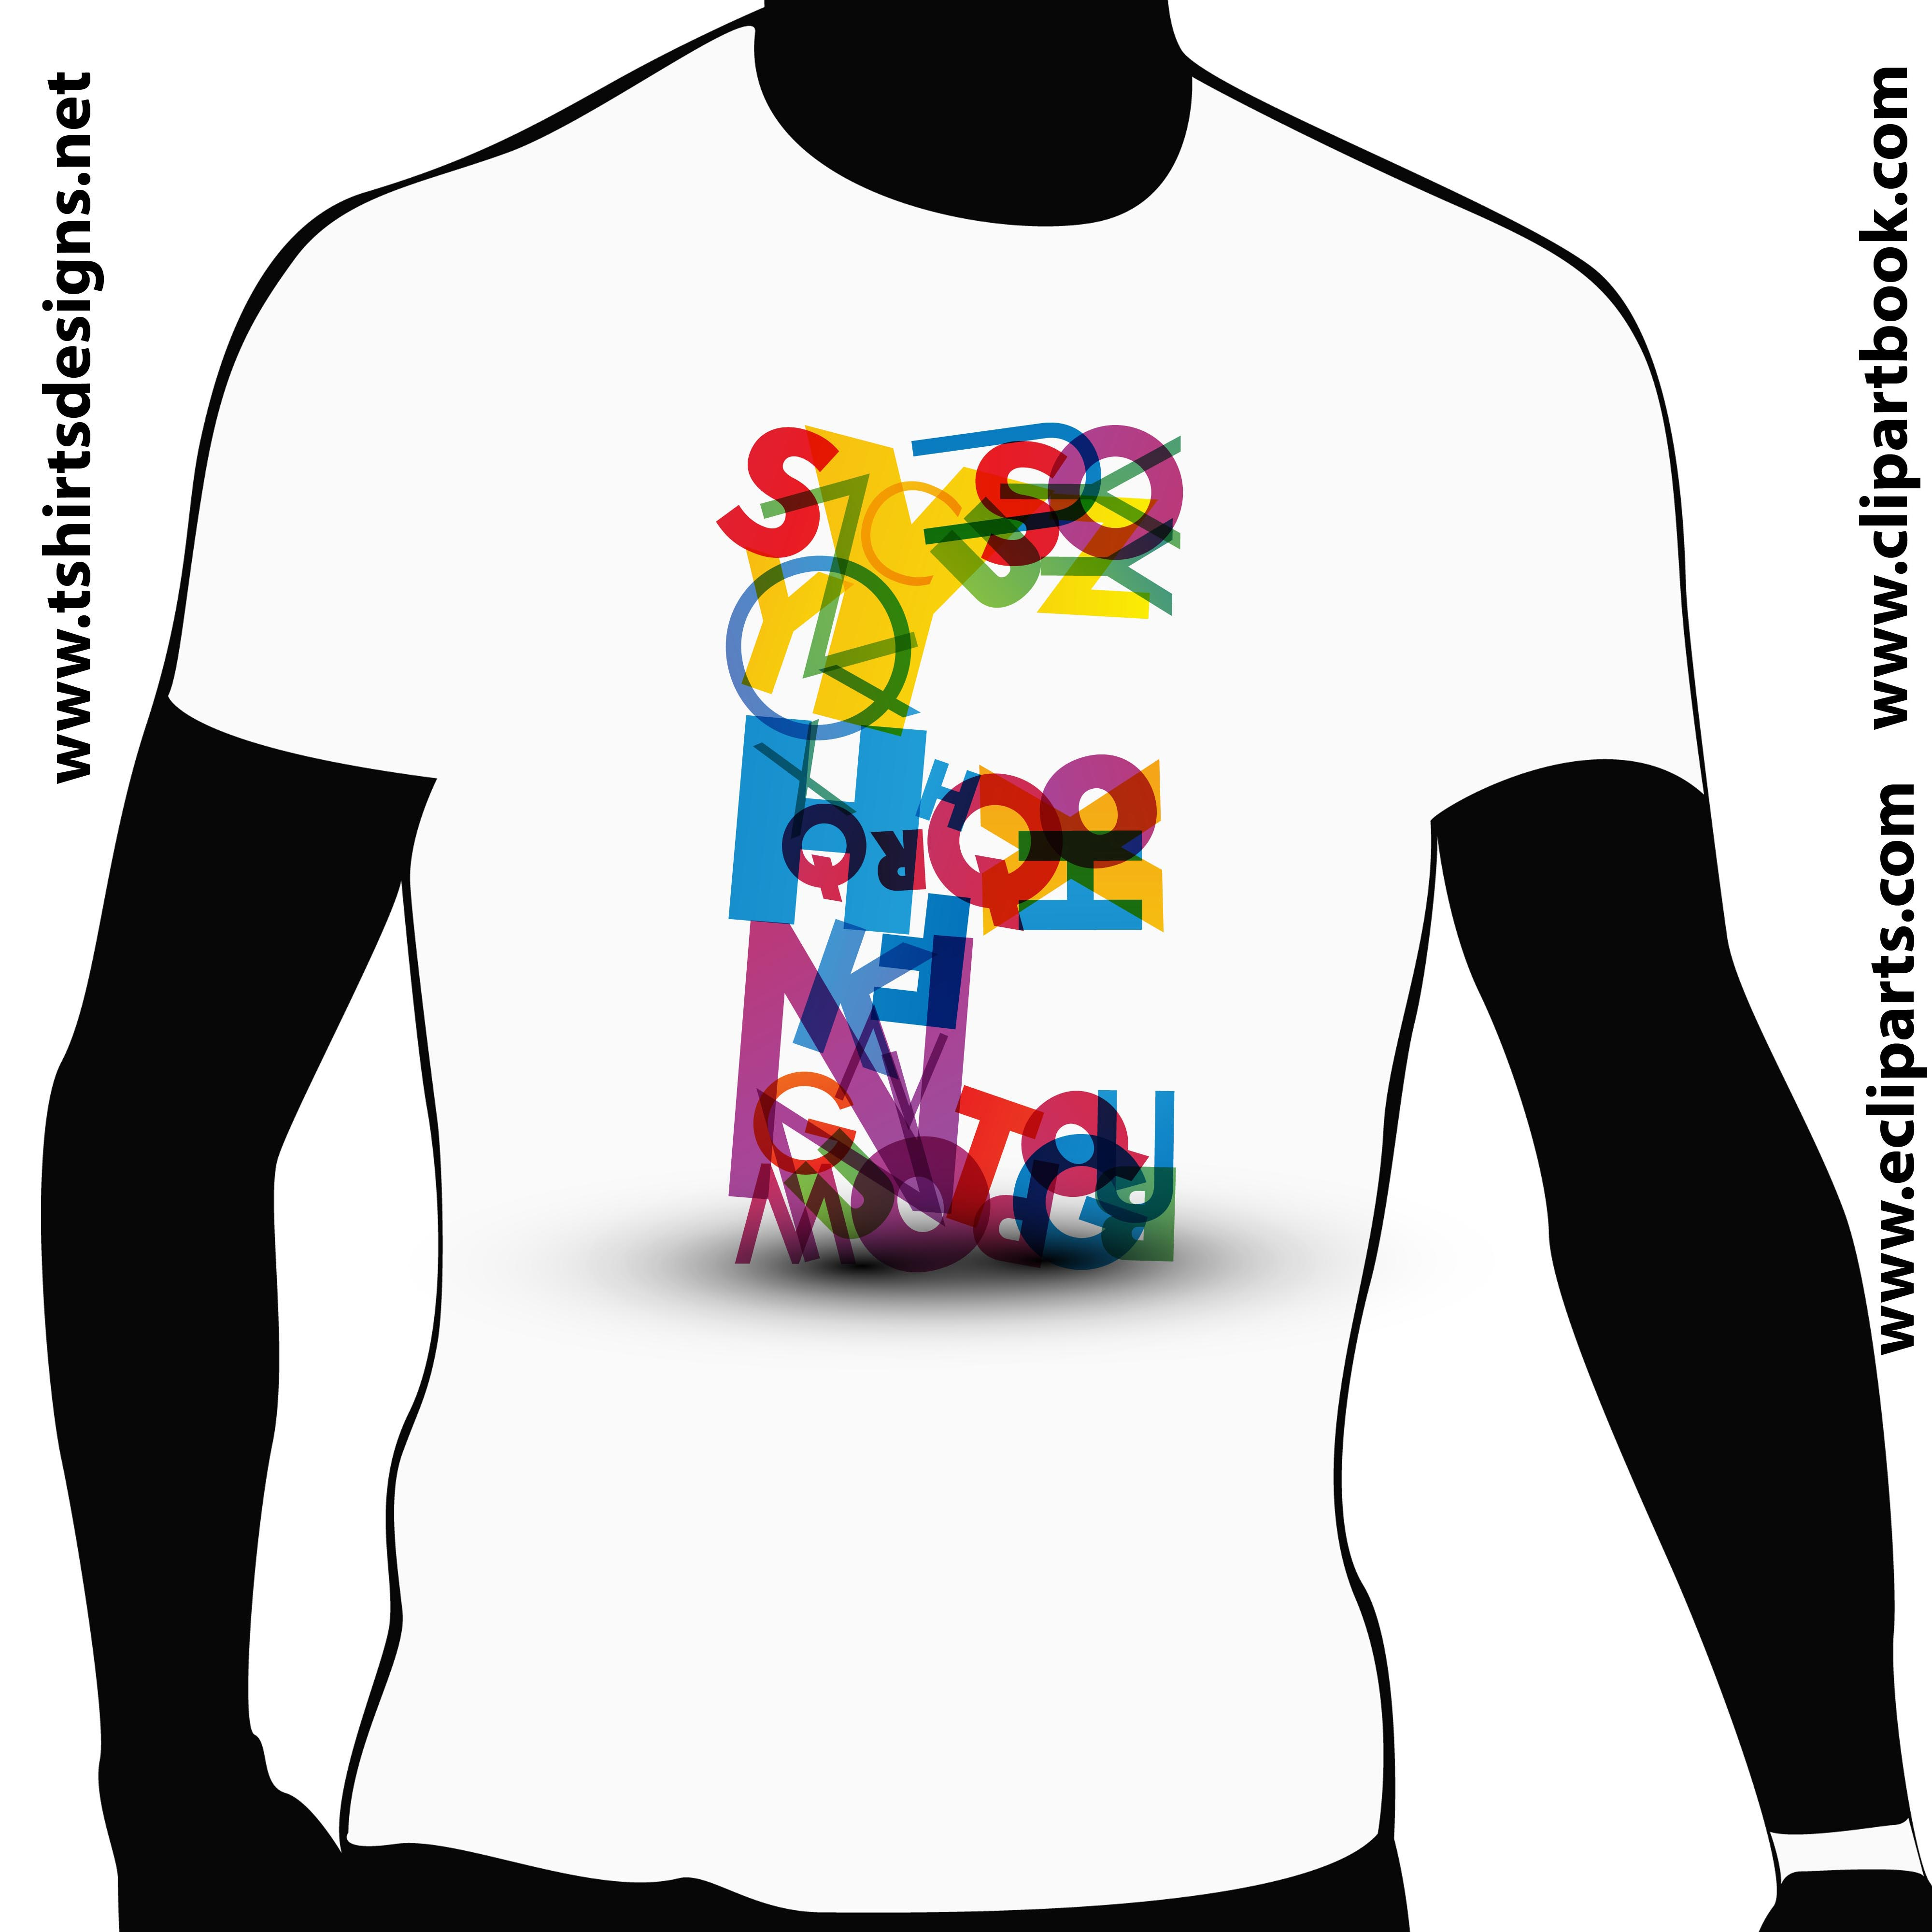 6602ac1a9 T Shirts Graphic Design Software   Kuenzi Turf & Nursery